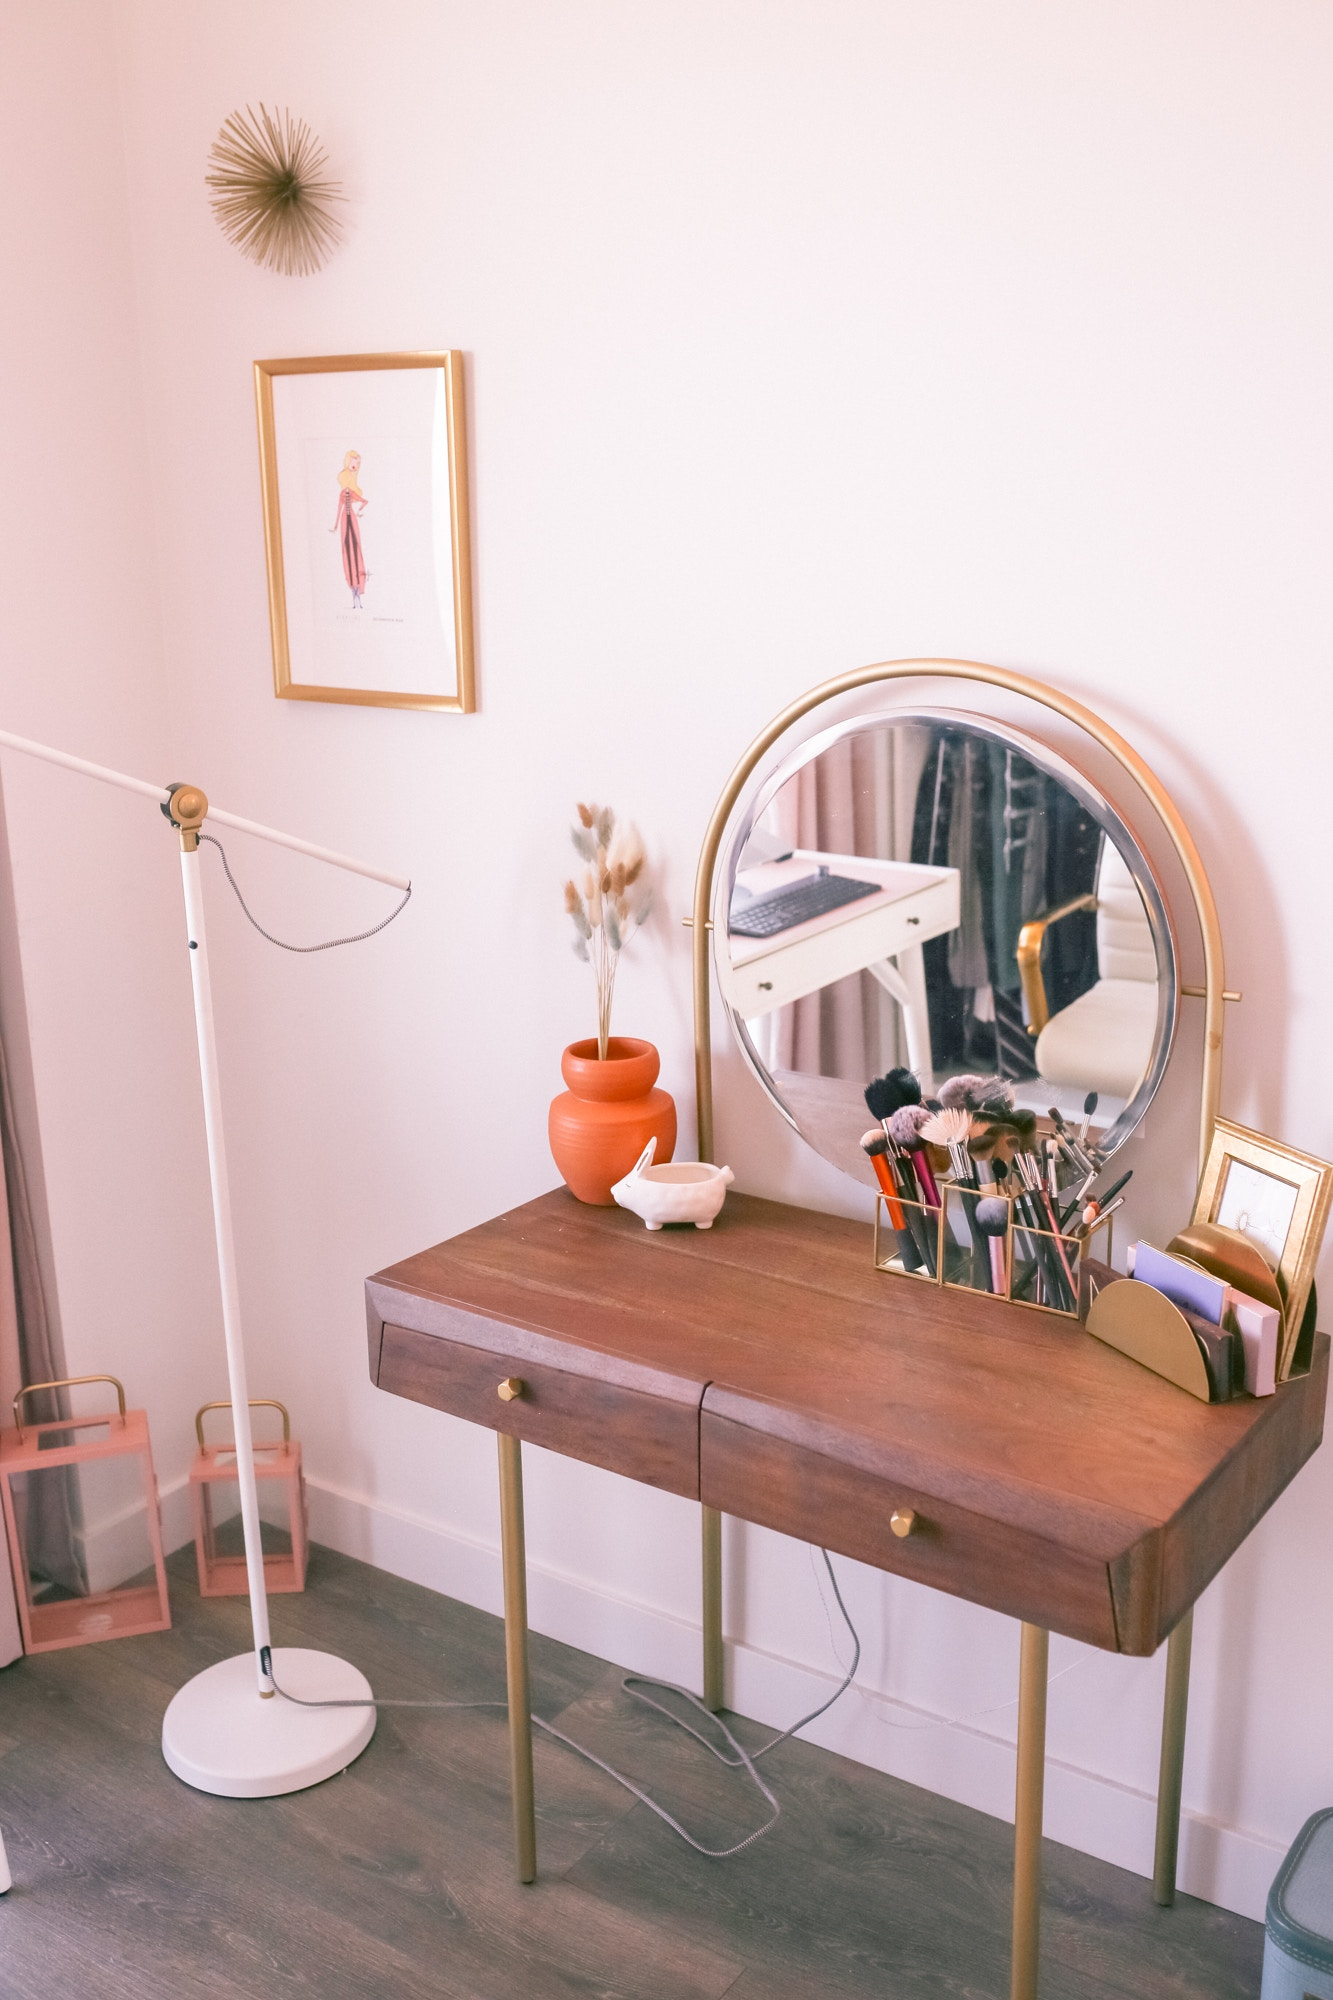 Mid-Century walnut vanity with gold hardware